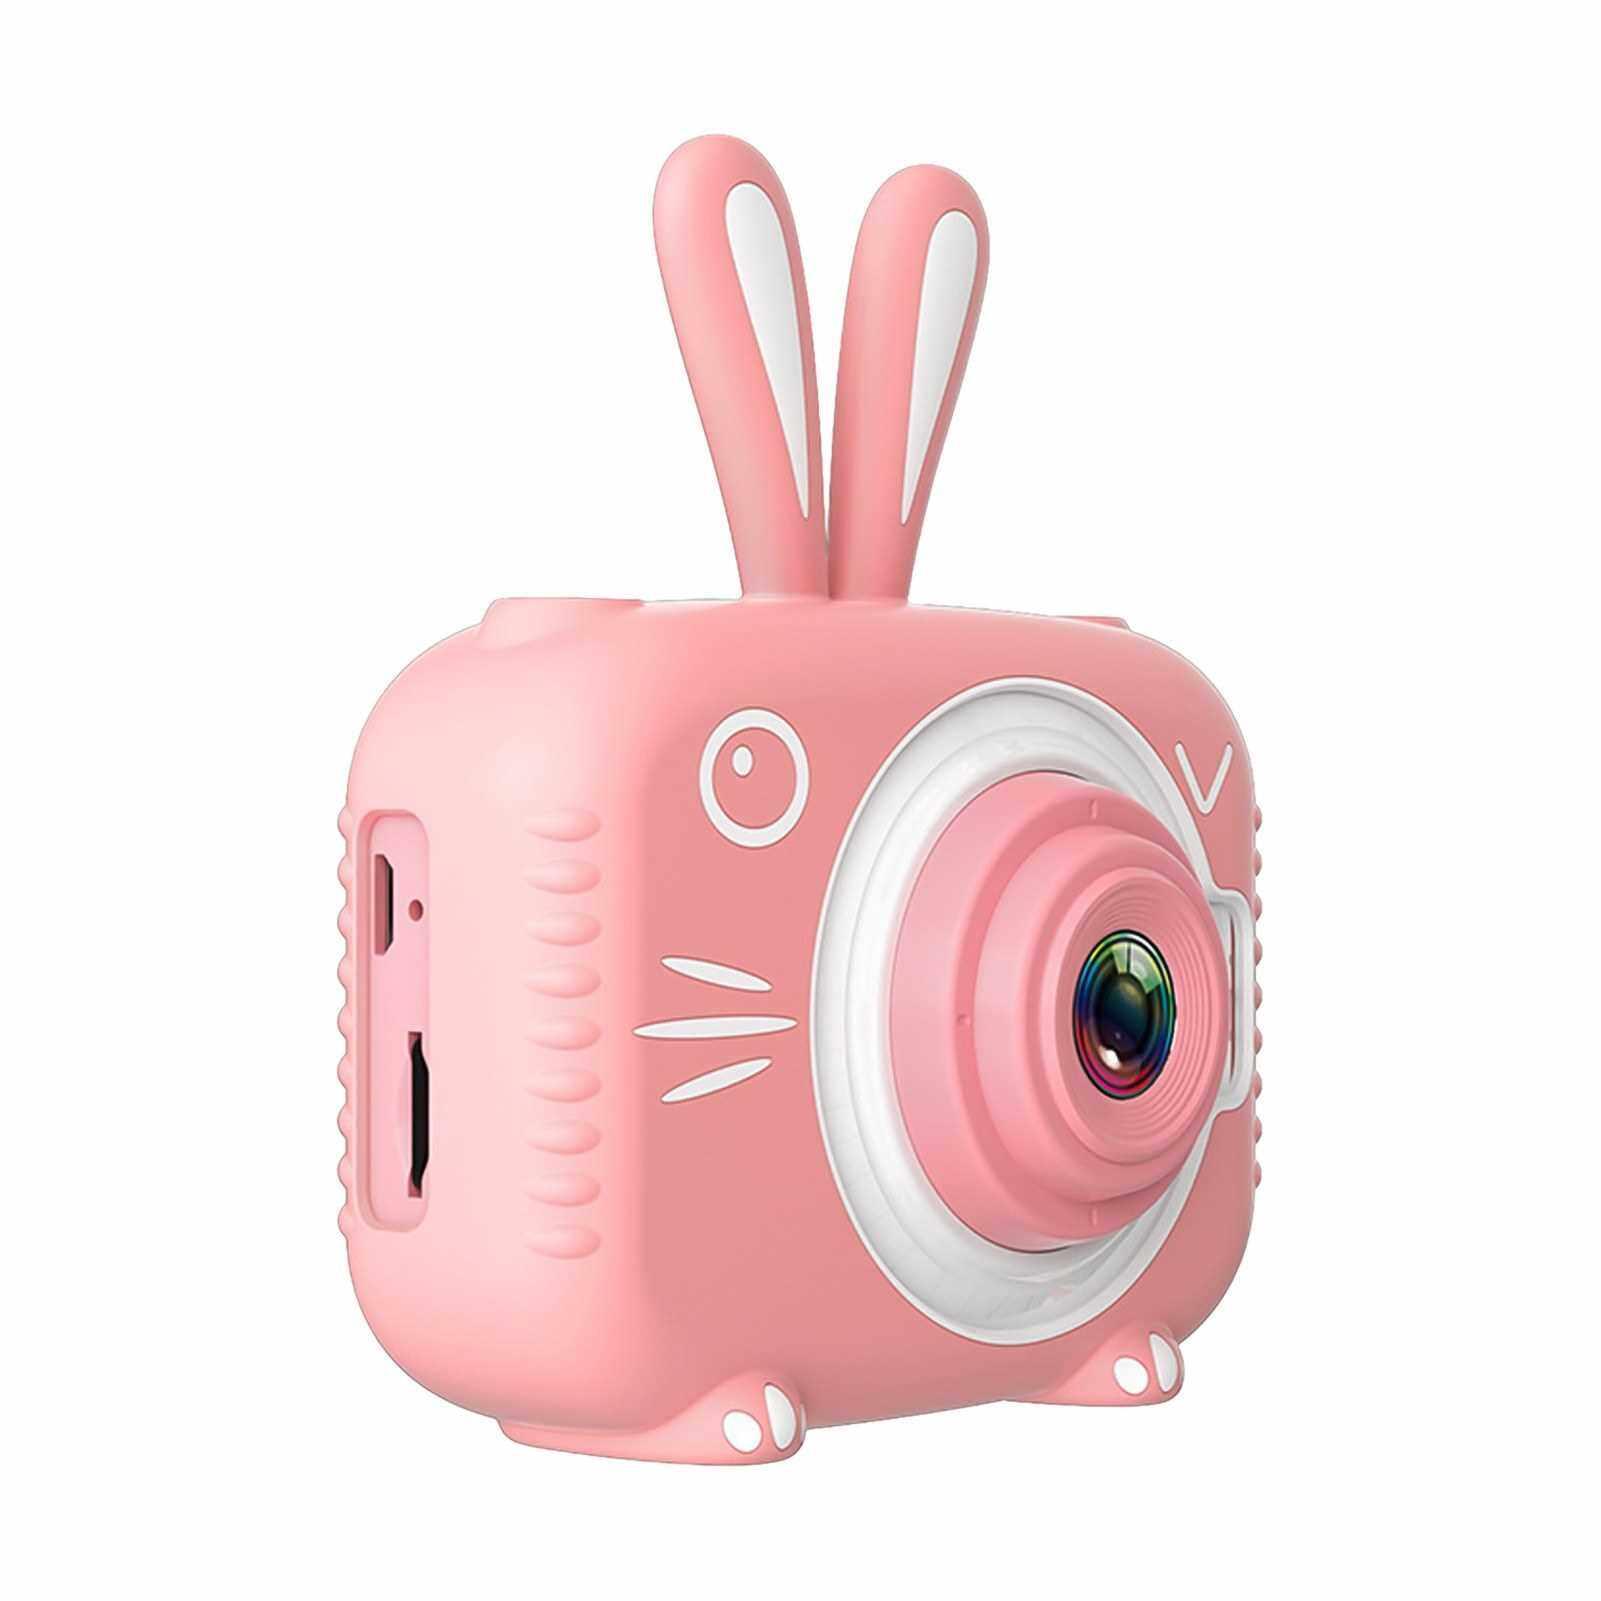 720P Portable Mini Kids Camera 20 Megapixel 2.0 Inch IPS Screen Cute Cartoon Animal Camera for Children Boys Girls (Pink)